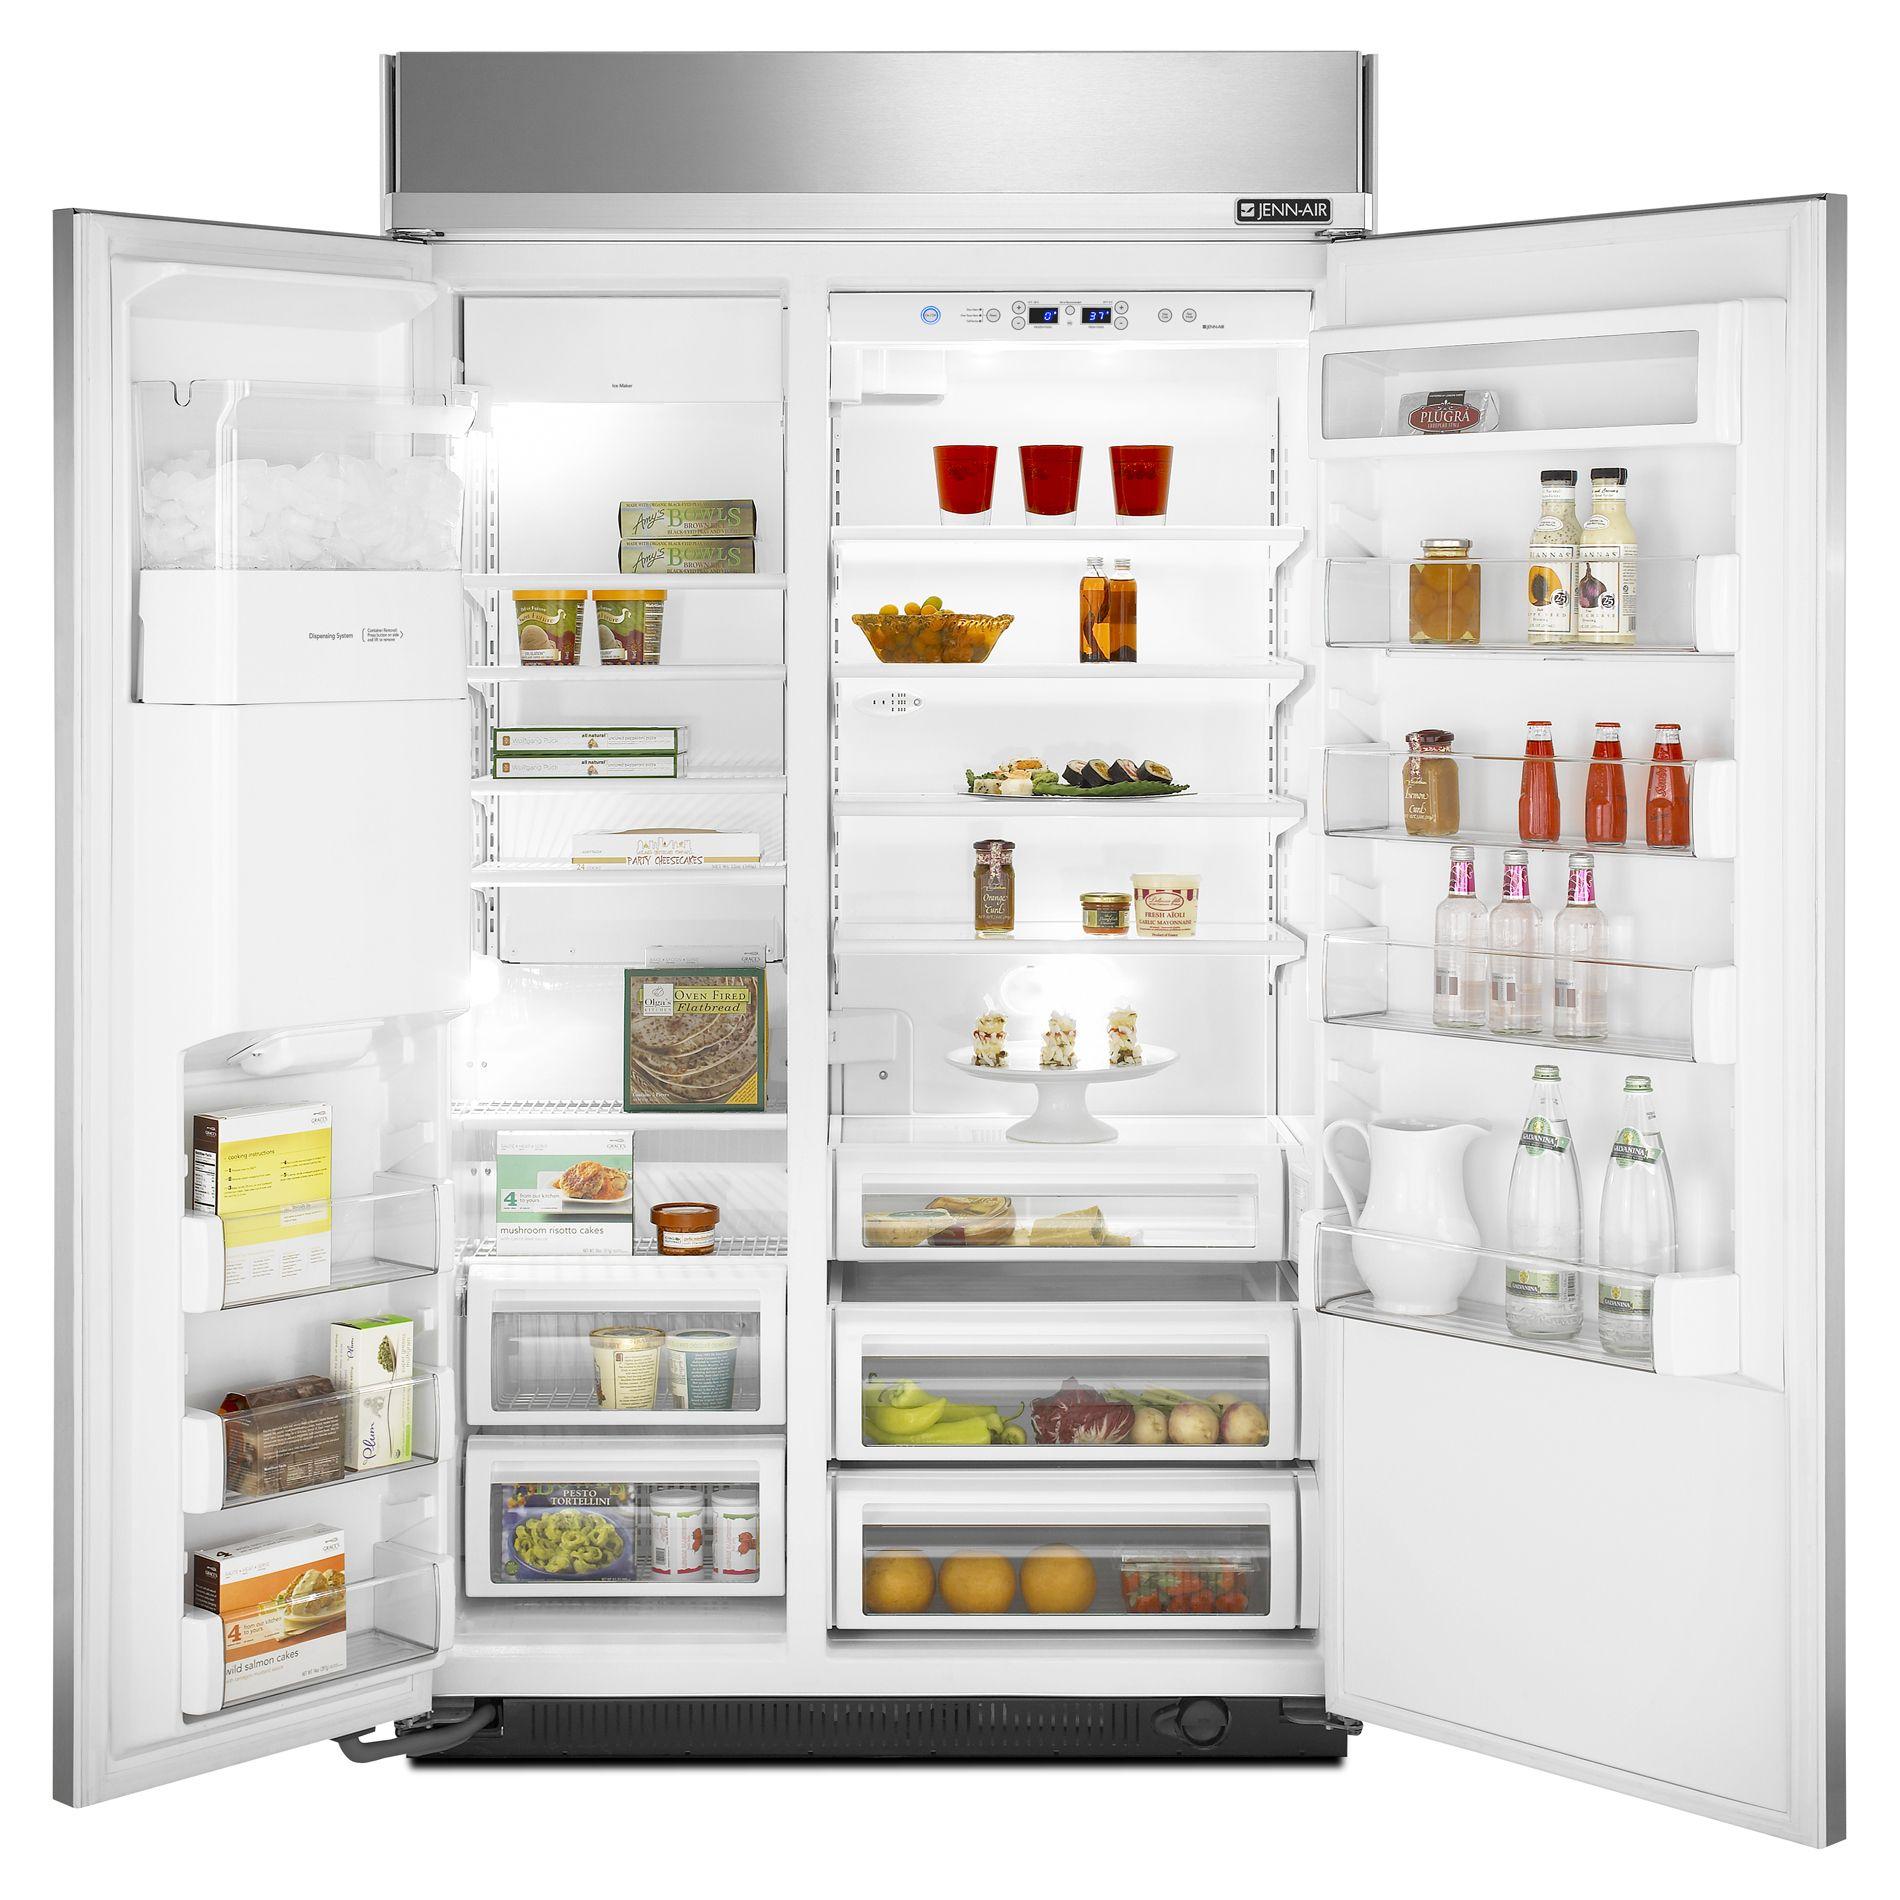 Jenn-Air 29.7 cu. ft. Built-In Side-By-Side Refrigerator w/ Dispenser